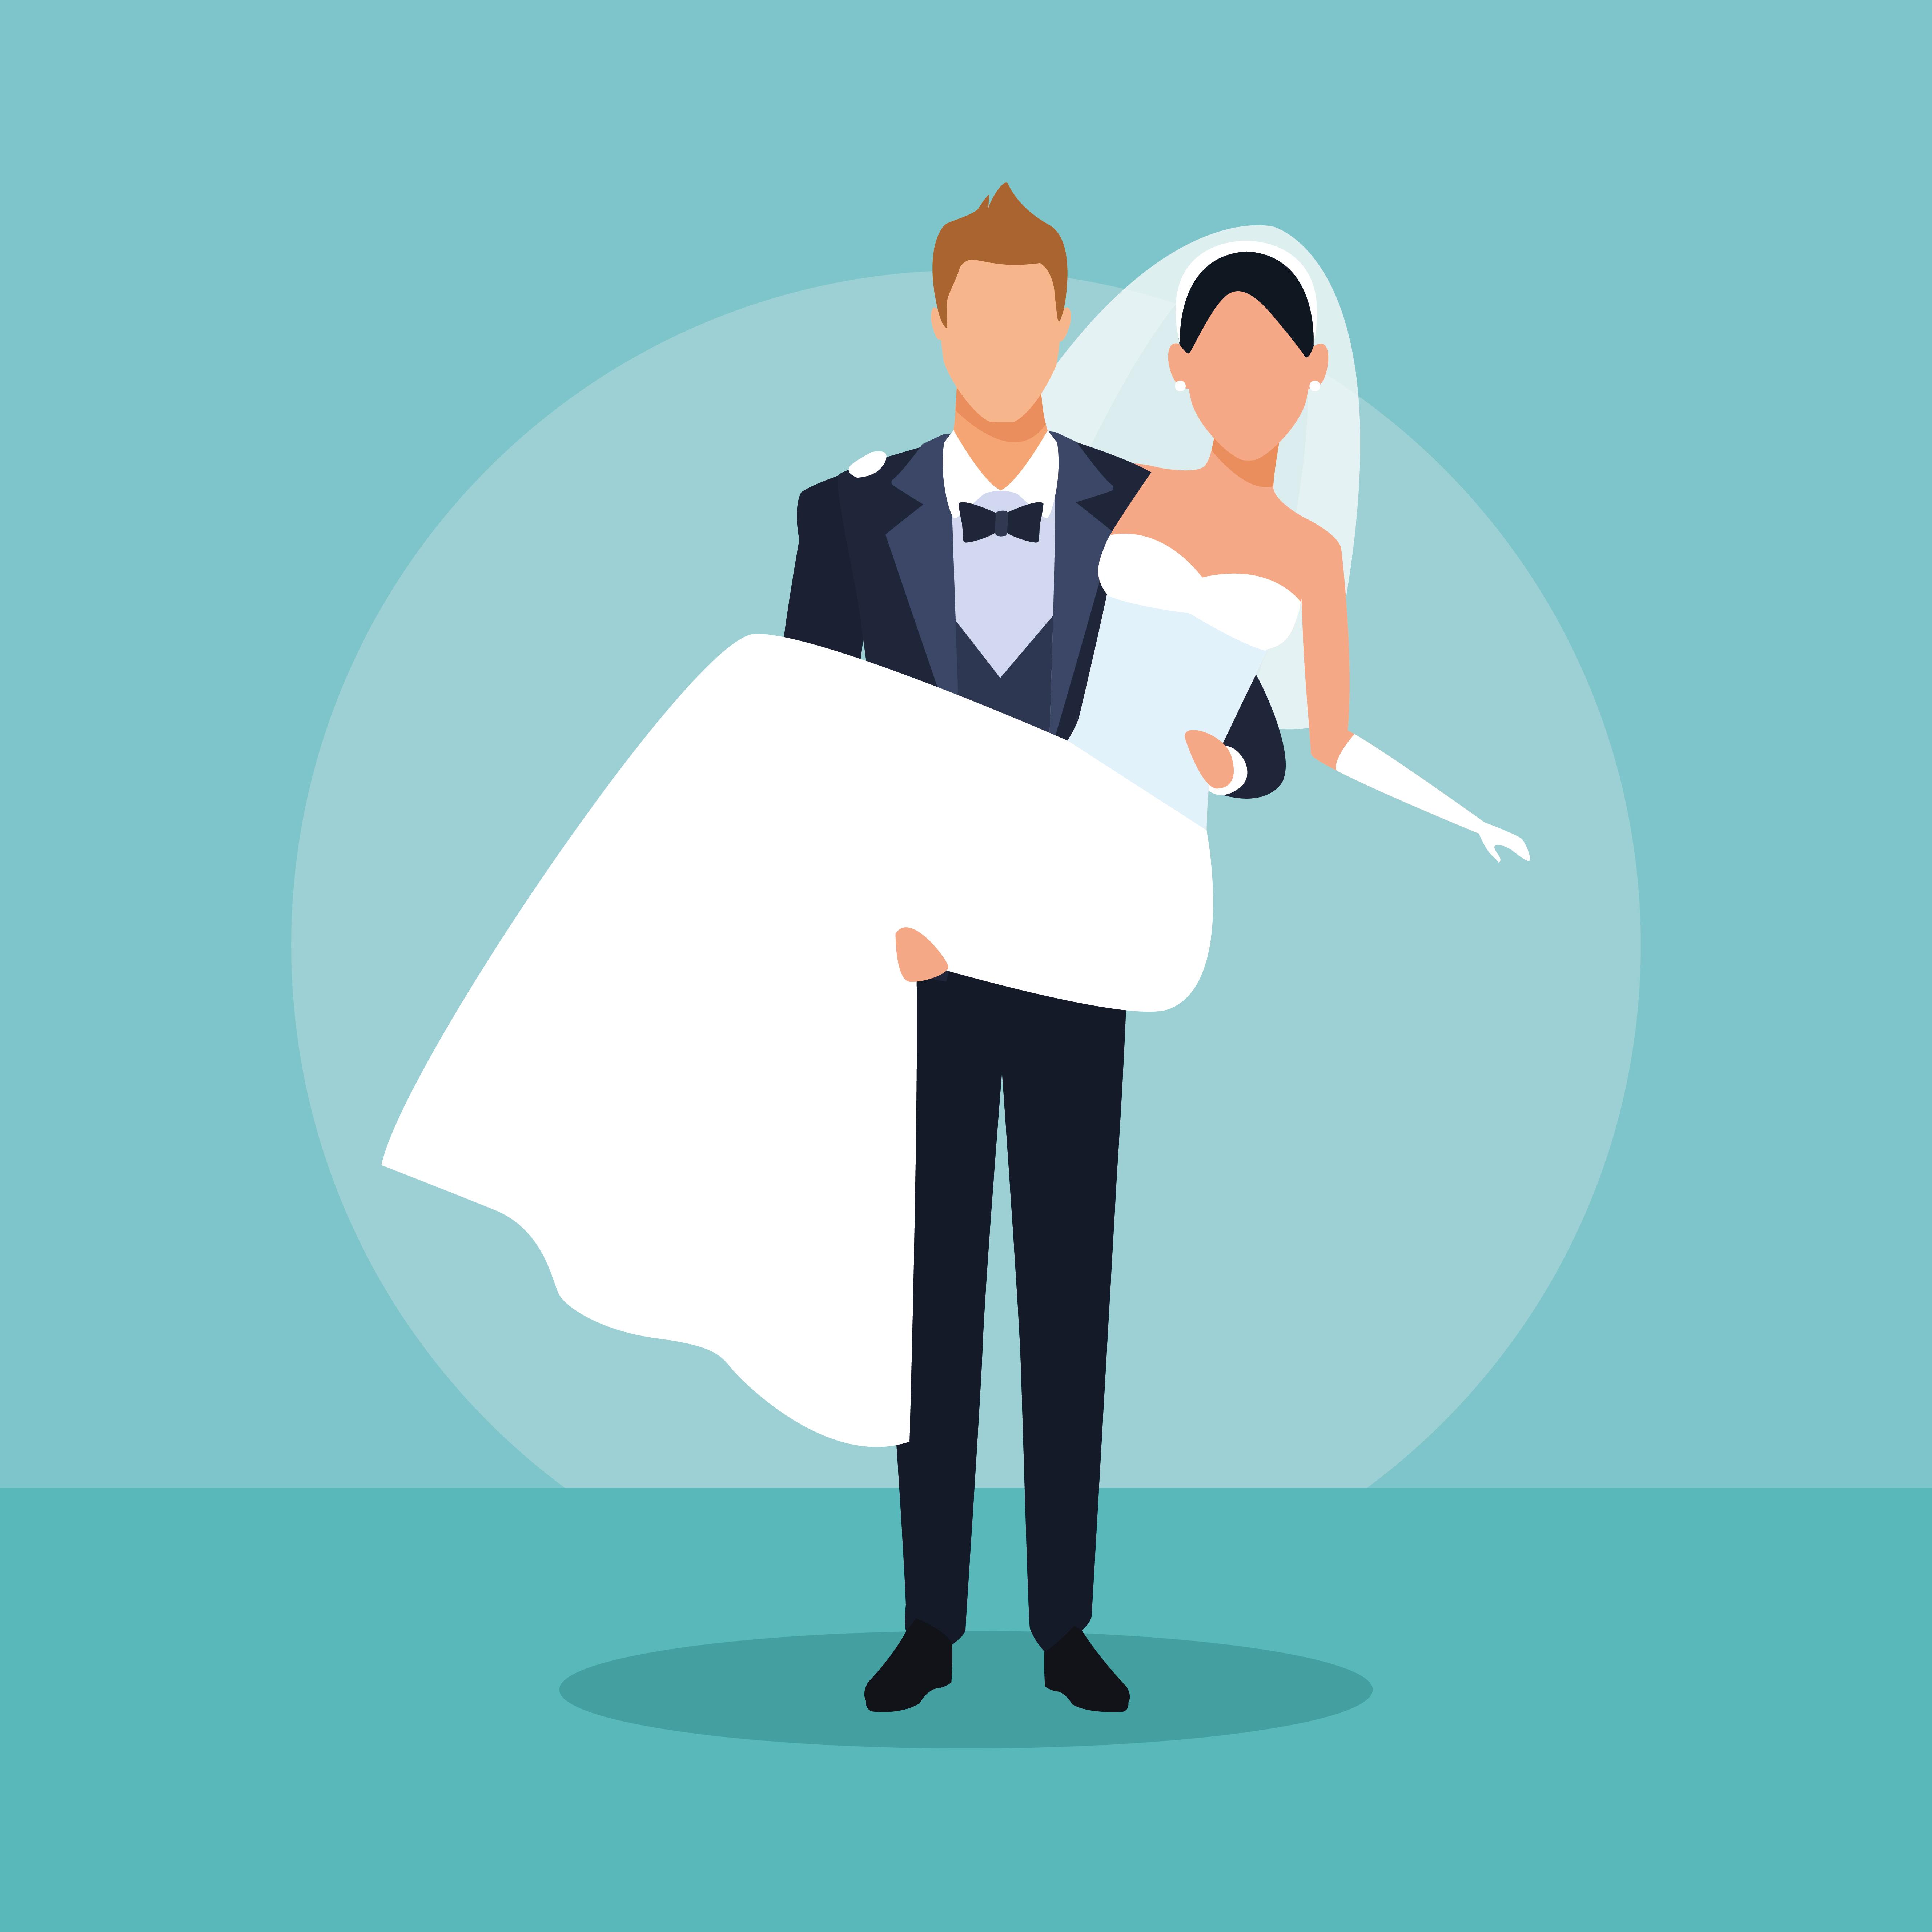 Wedding Couple Cartoon Download Free Vectors Clipart Graphics Vector Art